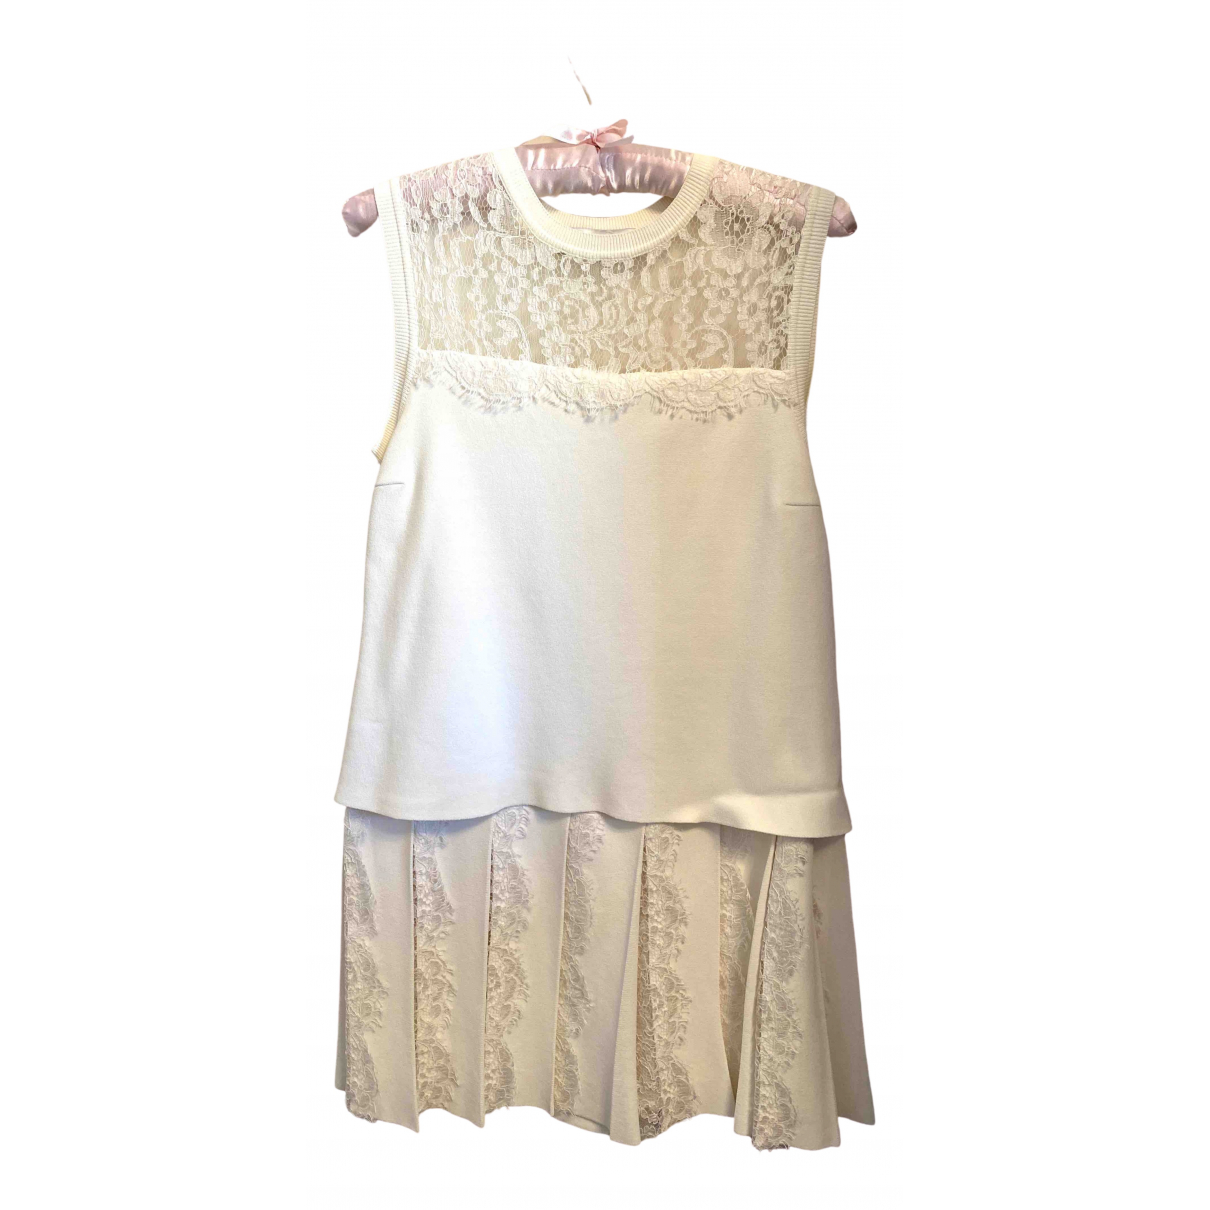 Valentino Garavani \N Kleid in  Ecru Synthetik